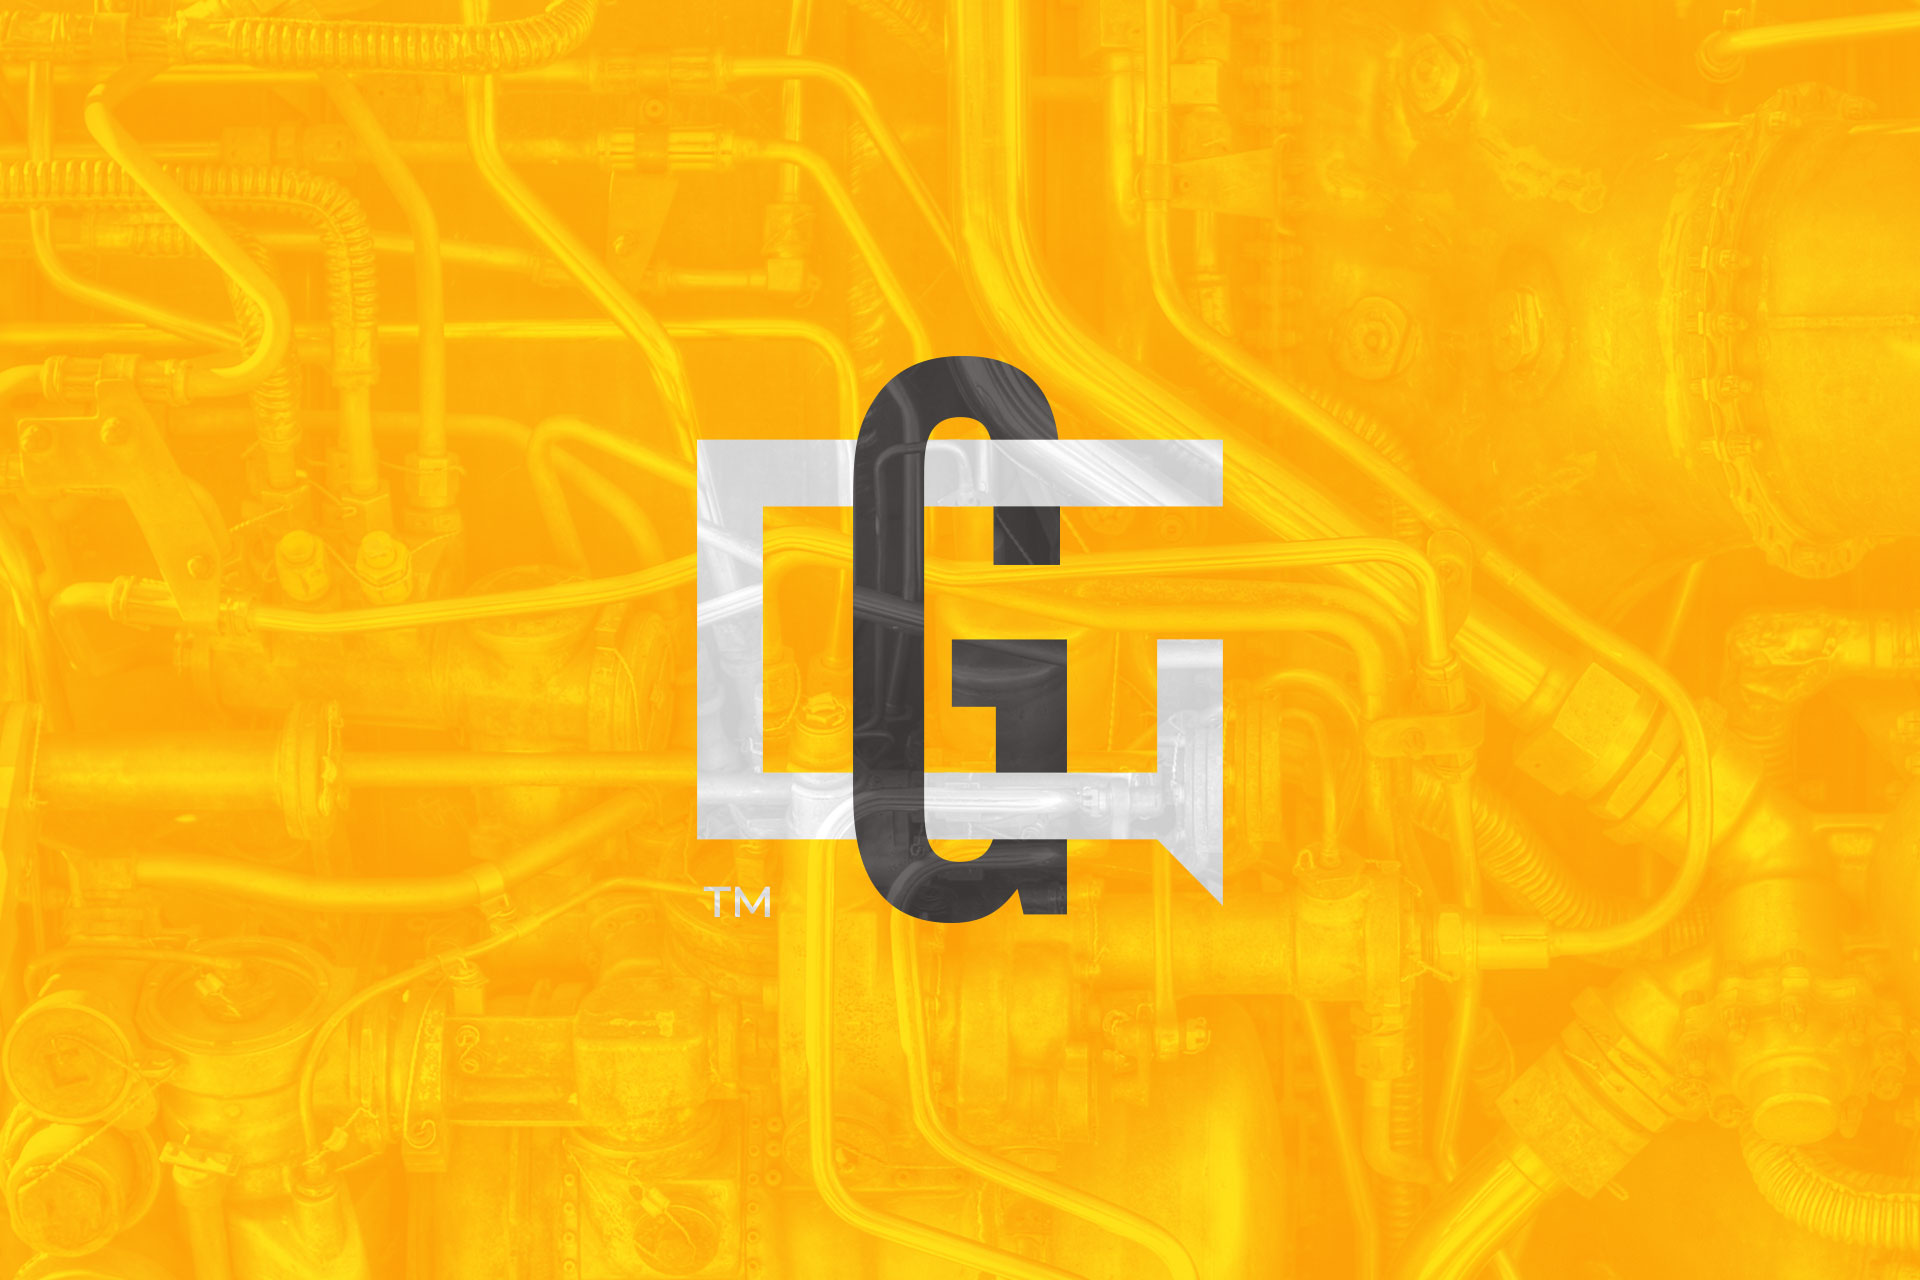 Grits & Grids website update announcement